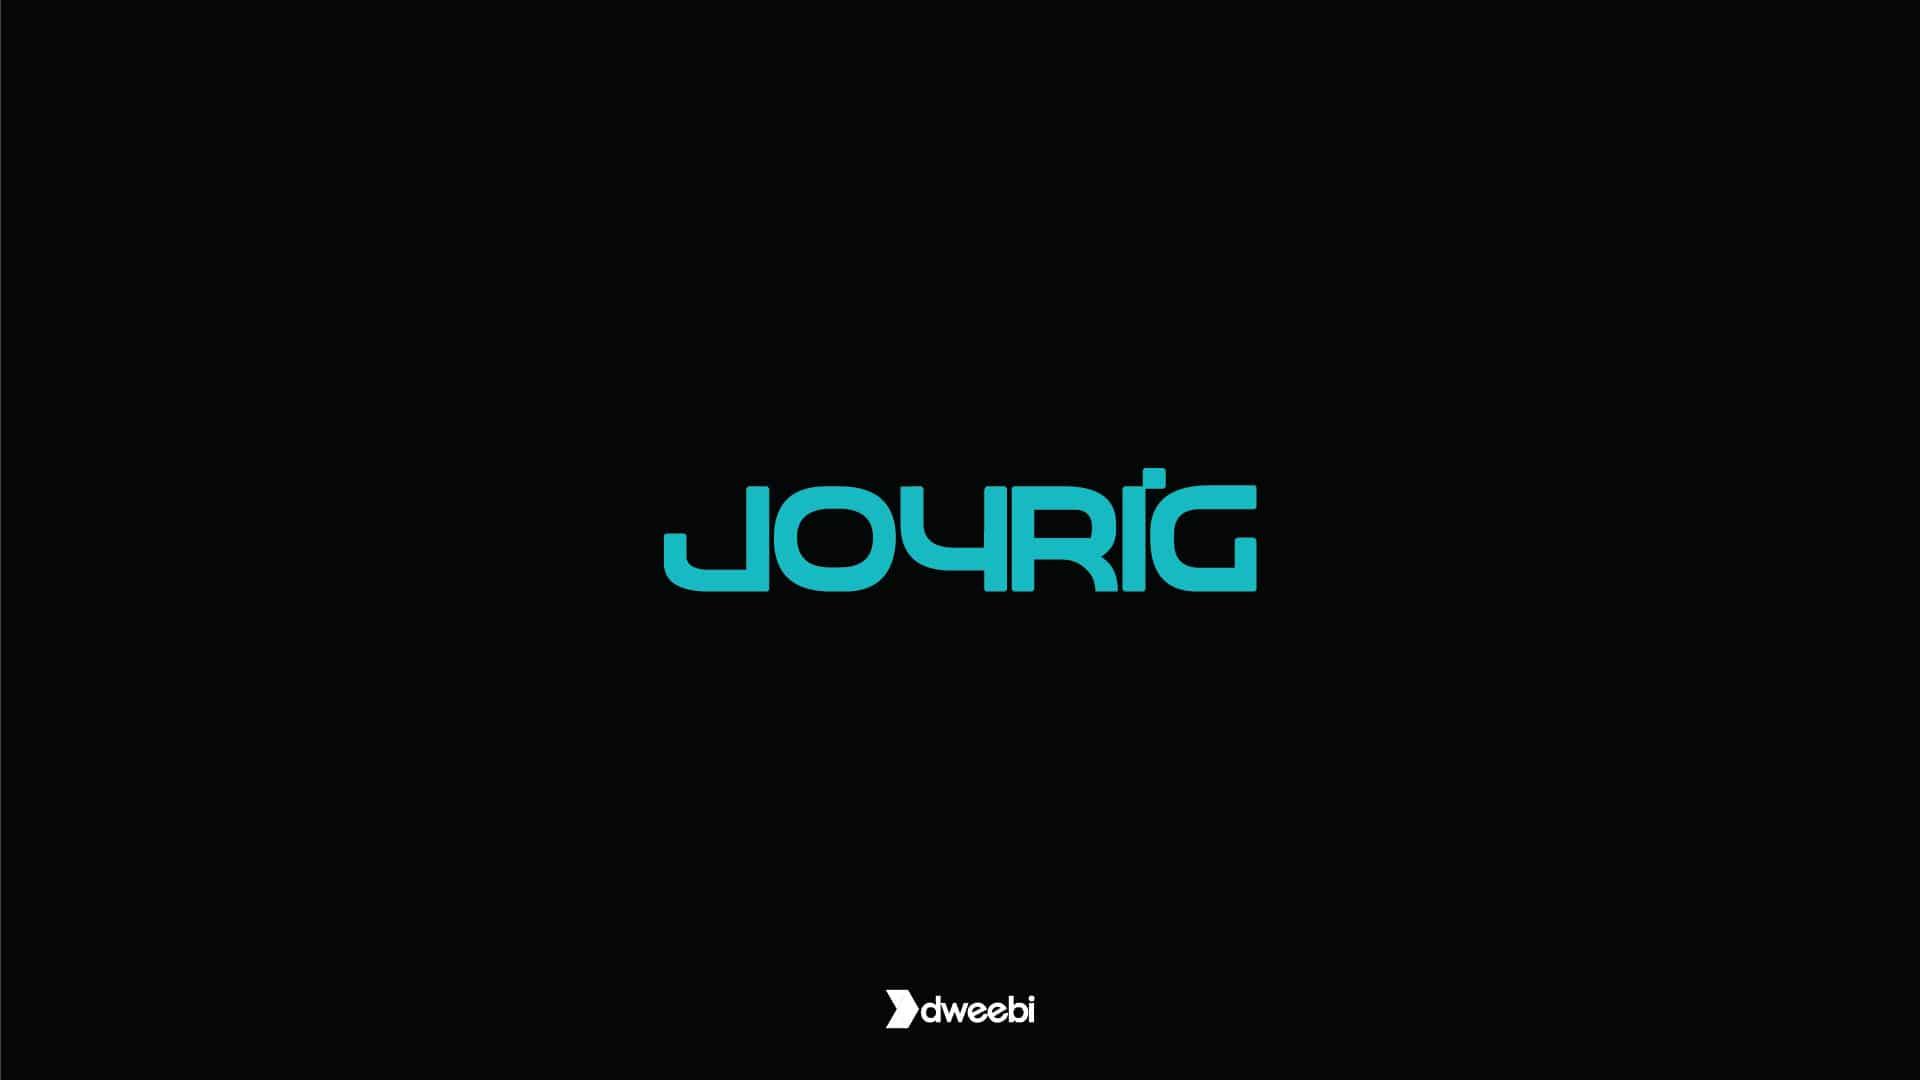 Joyrig brand guideline example-01